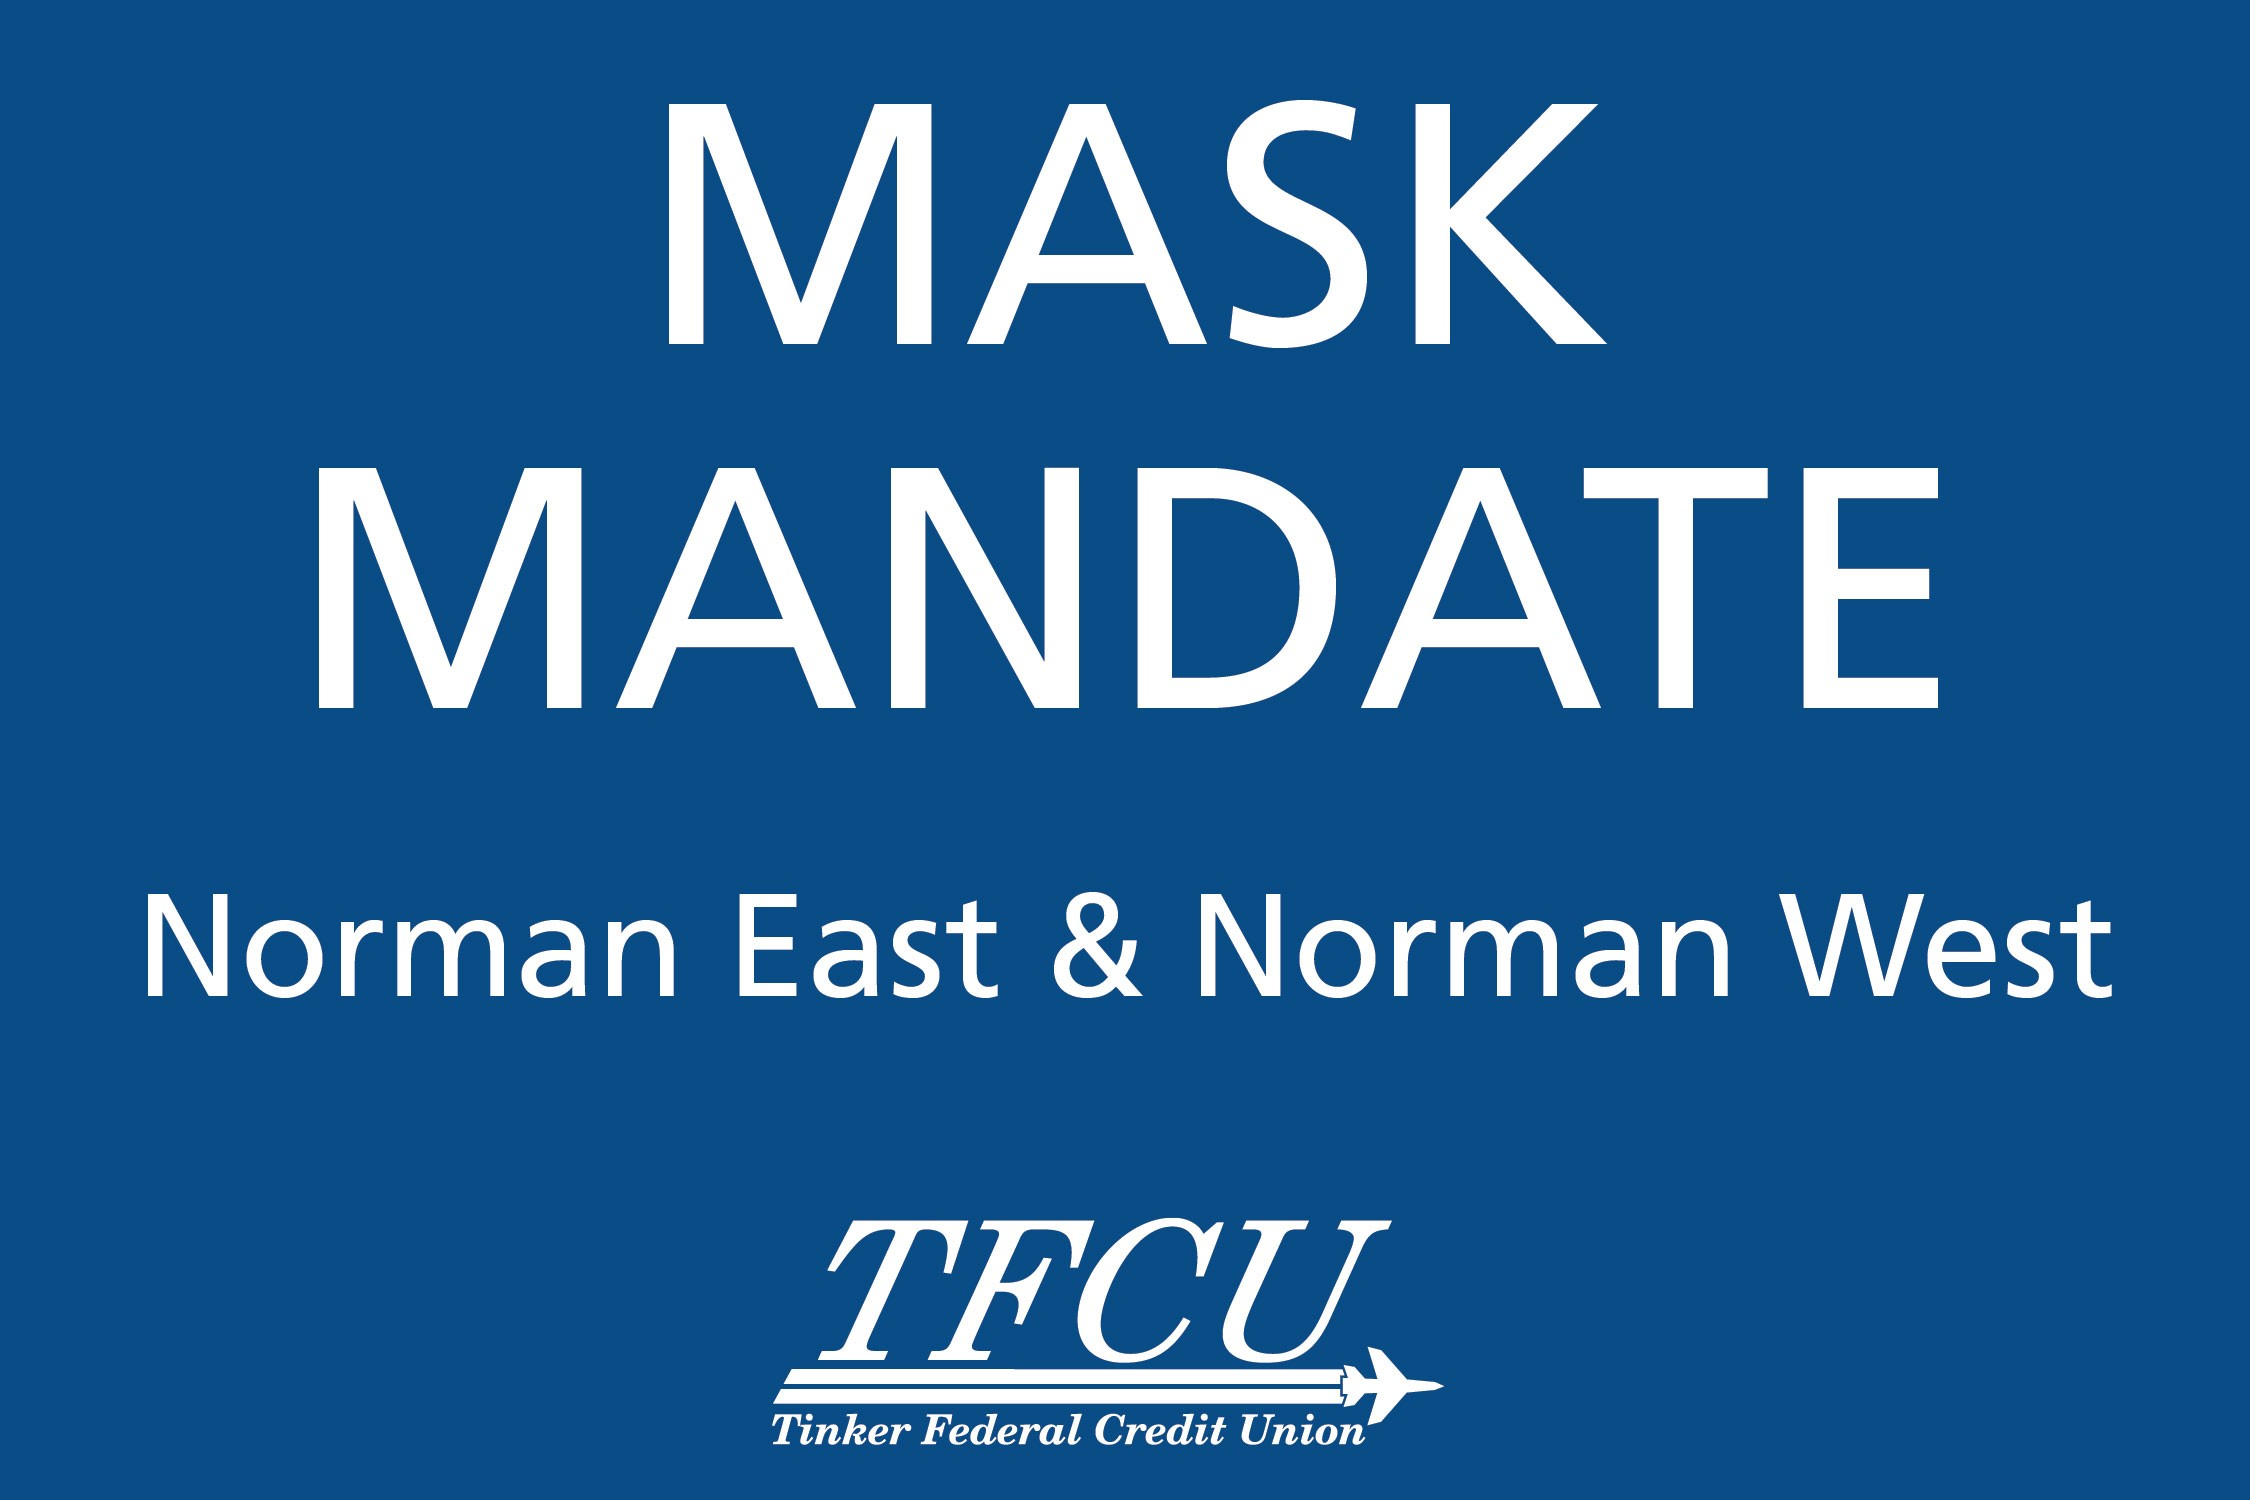 Norman Mask Mandate